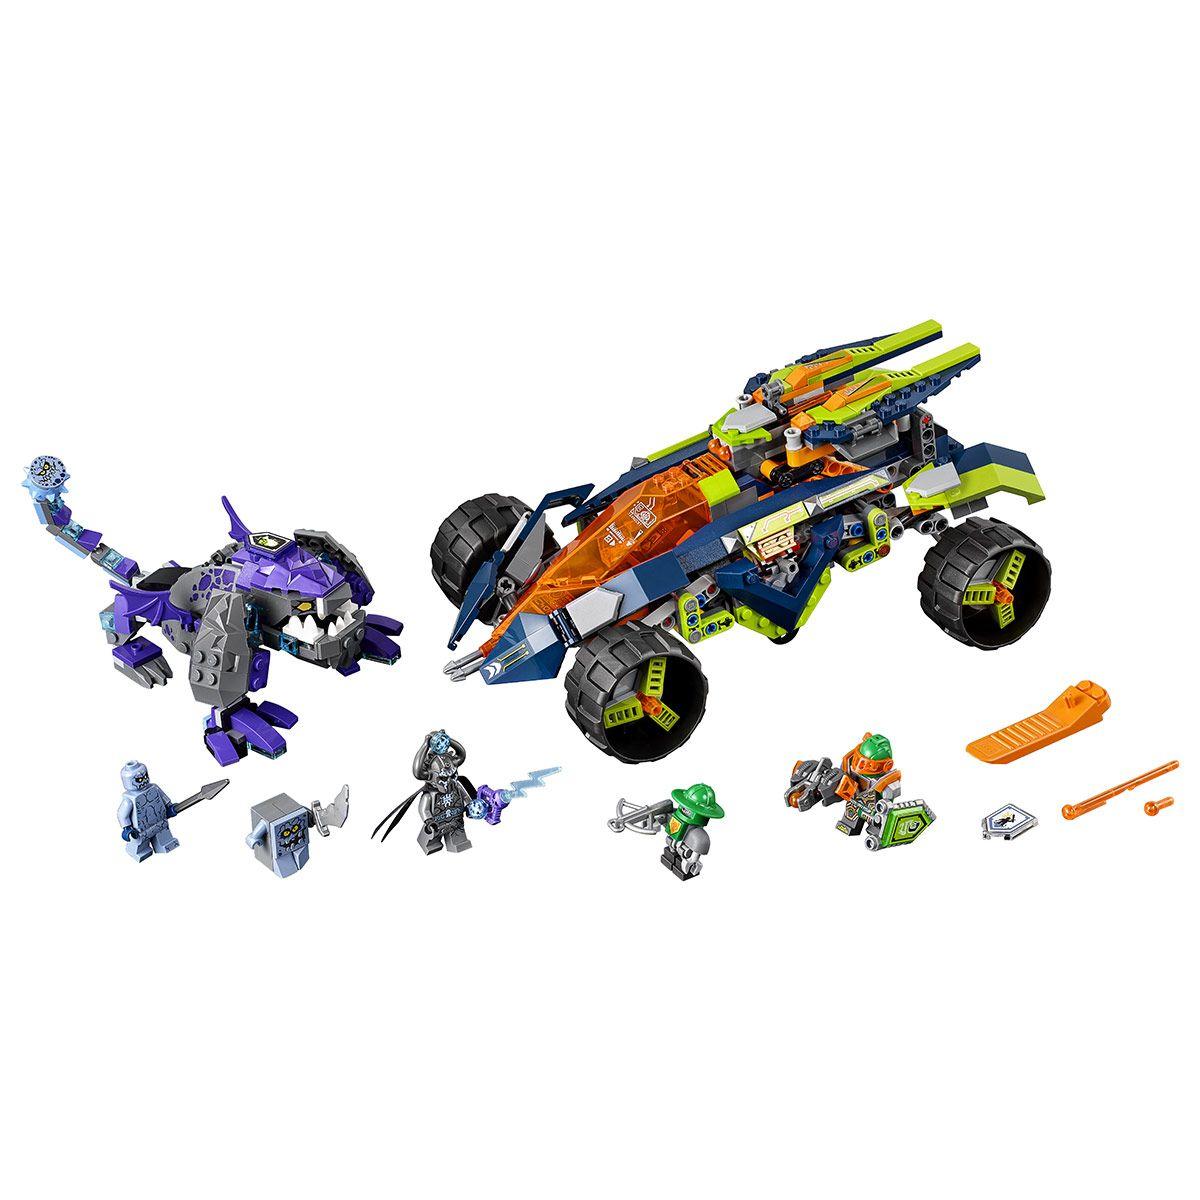 Nexo Le Turbo Knights D'aaron 70355 4x4 Lego® PiratesChevaliers nwPk8NO0XZ